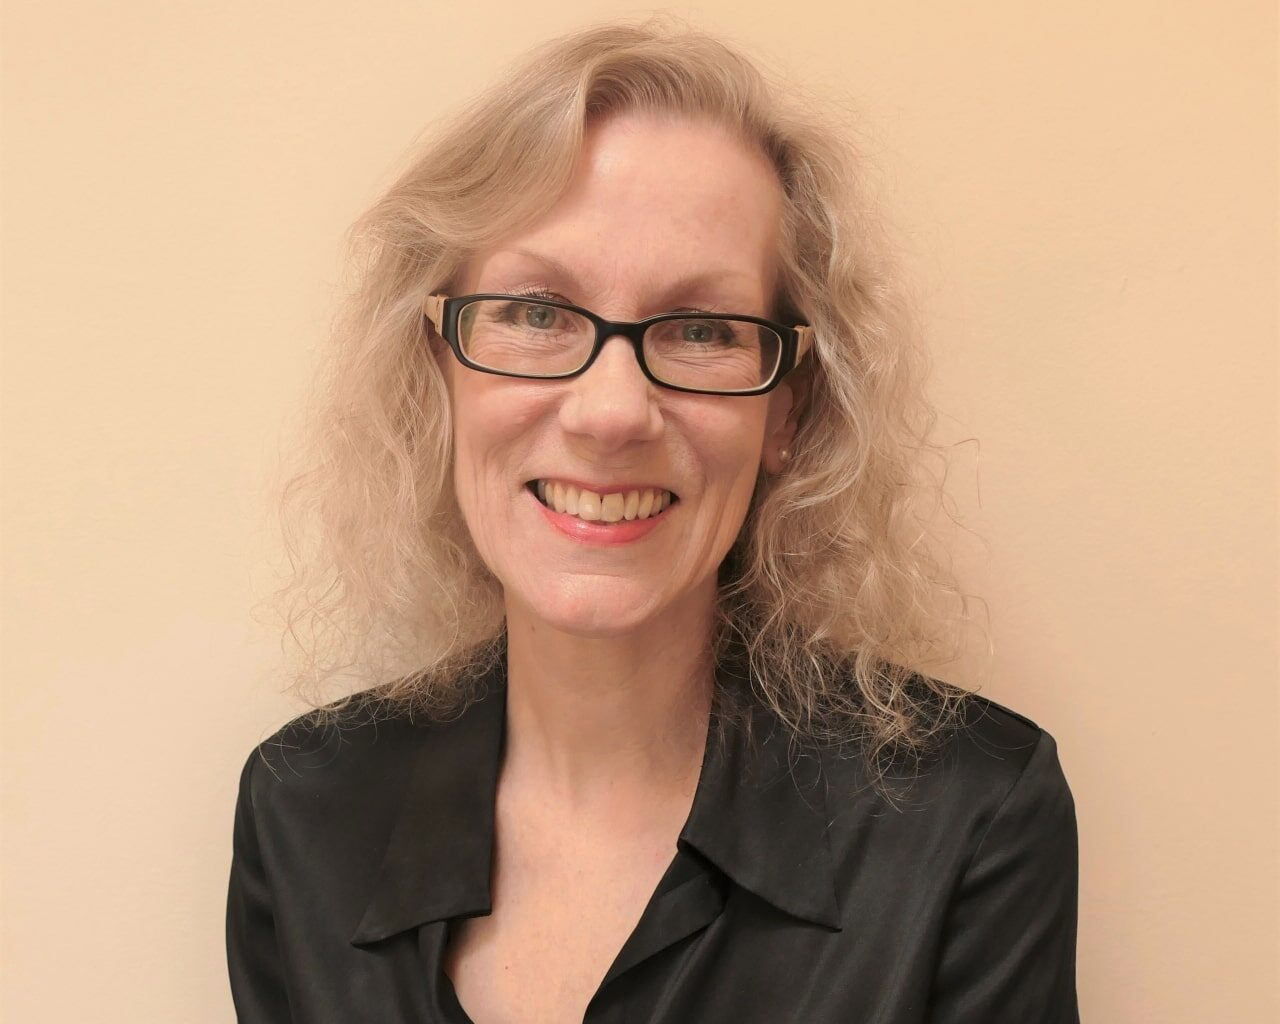 Lesley-Anne Long